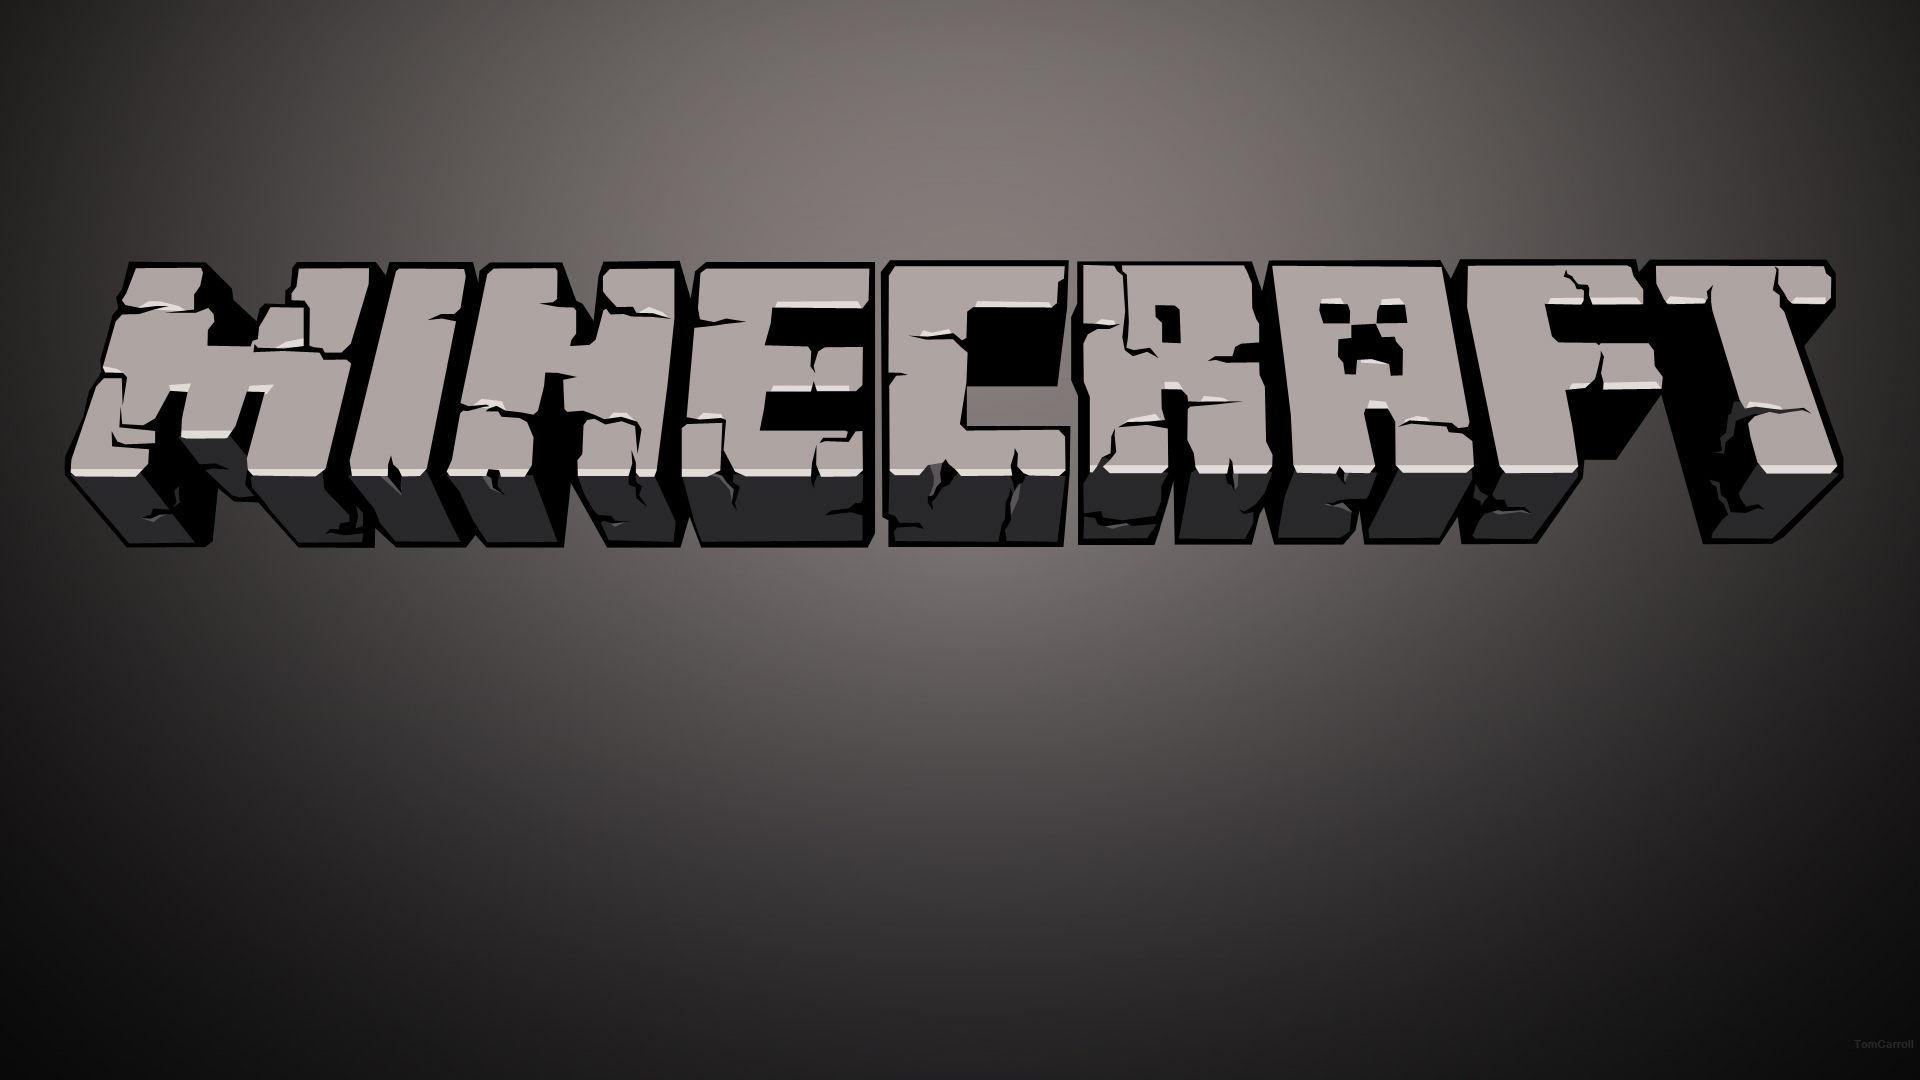 550 - ¿Cuánto sabes sobre Minecraft?